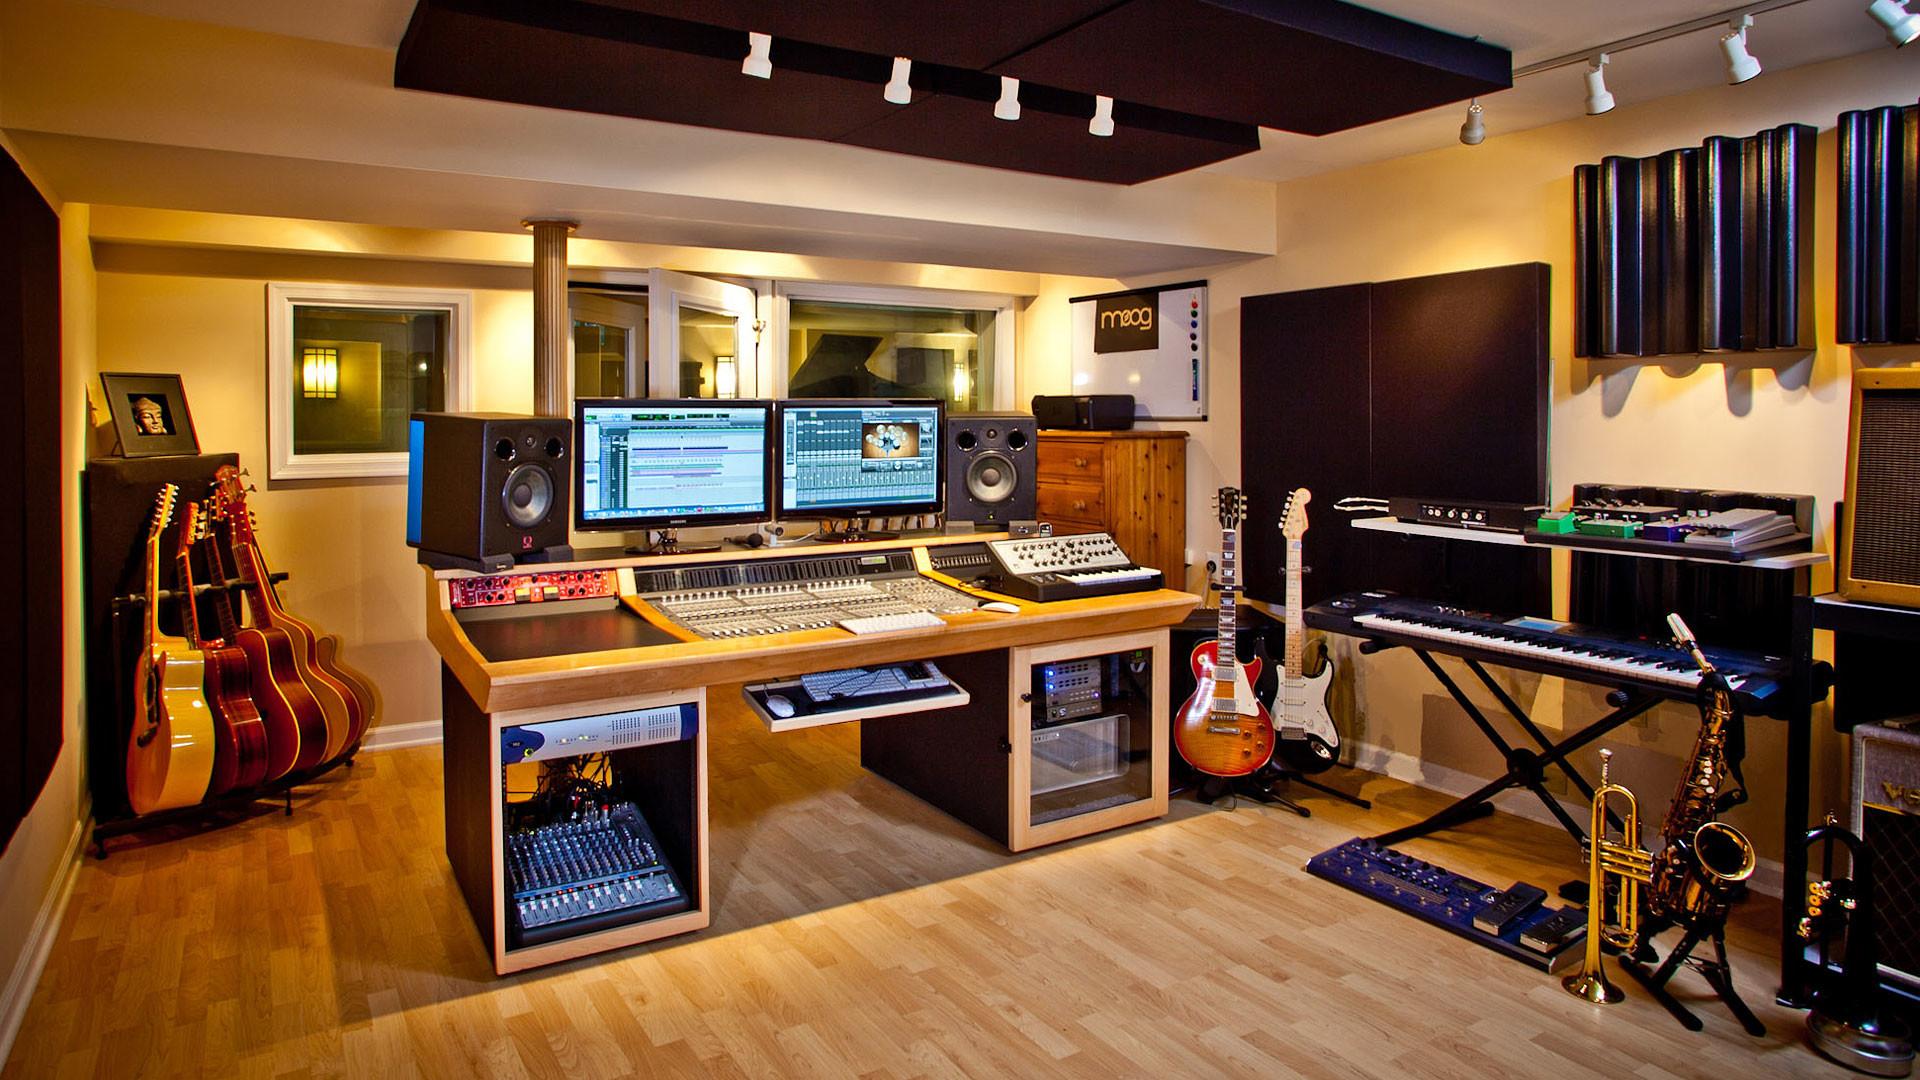 Recording Studio Wallpaper The Recording Studio Data Music Room Recording Studio 1920x1080 Wallpaper Teahub Io